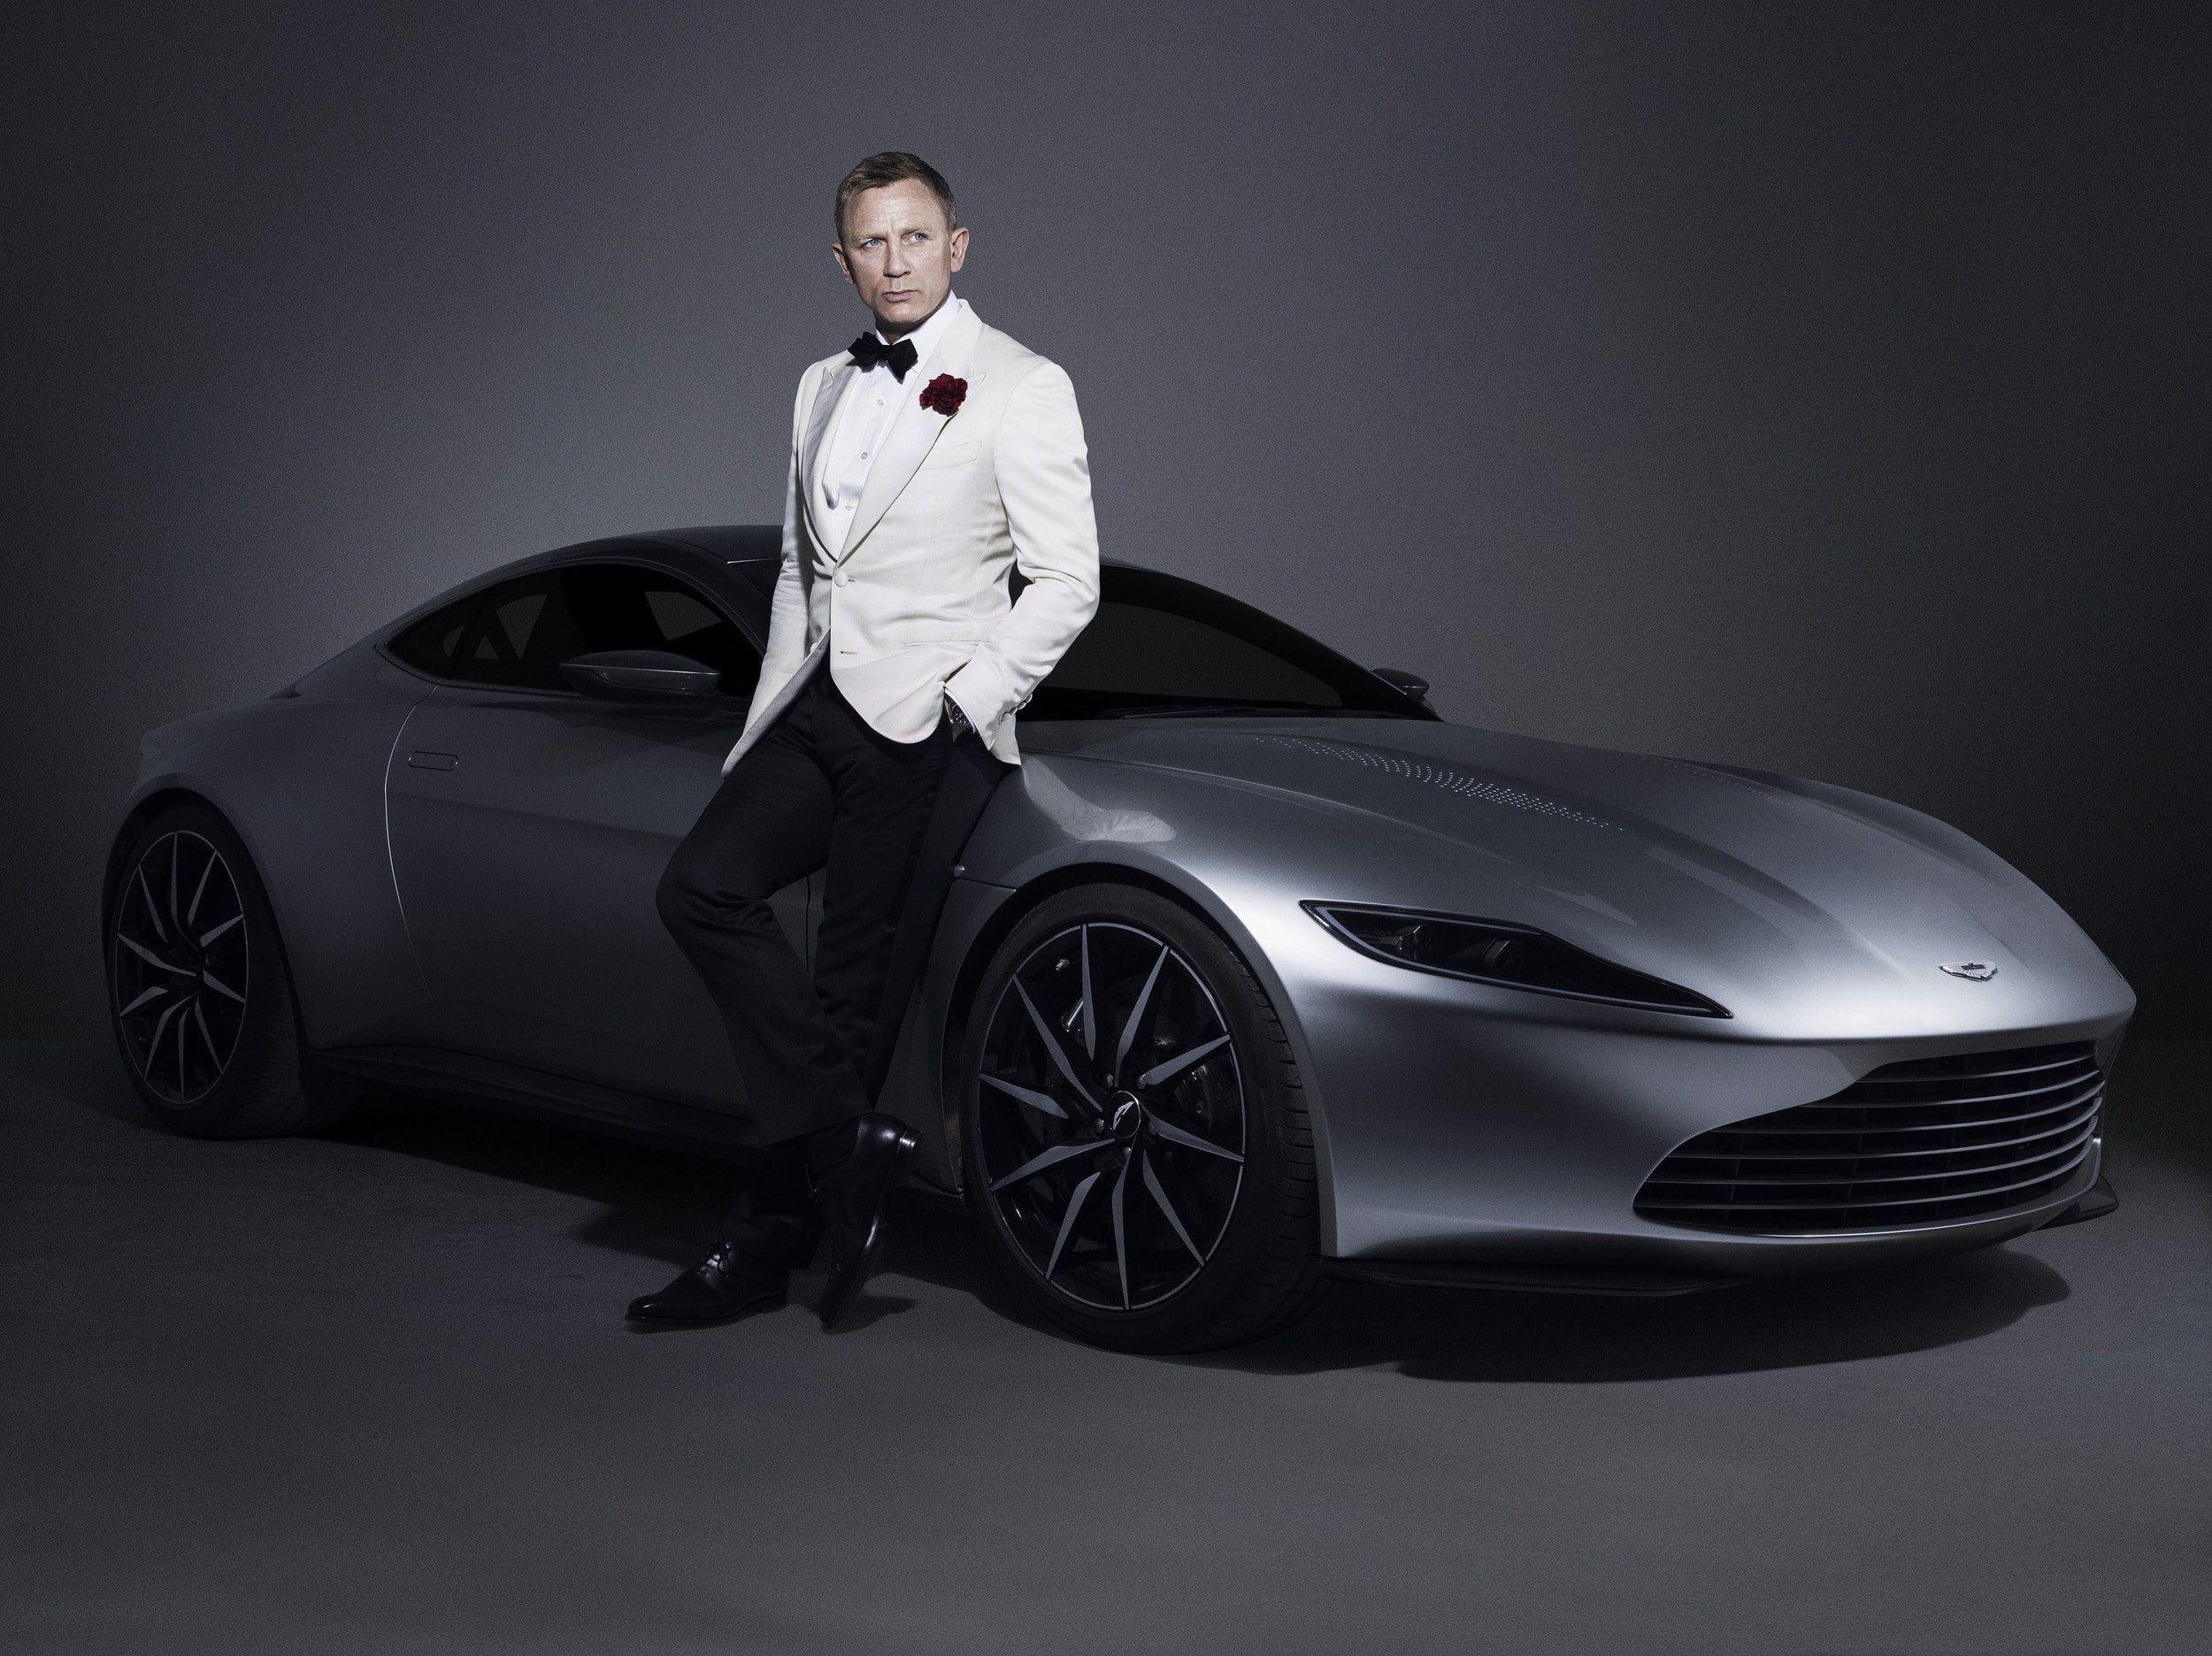 Men Actor Celebrity Daniel Craig James Bond 007 Aston Martin Car Aston Martin Db10 Simple Background S Aston Martin Db10 Aston Martin Rapide Aston Martin